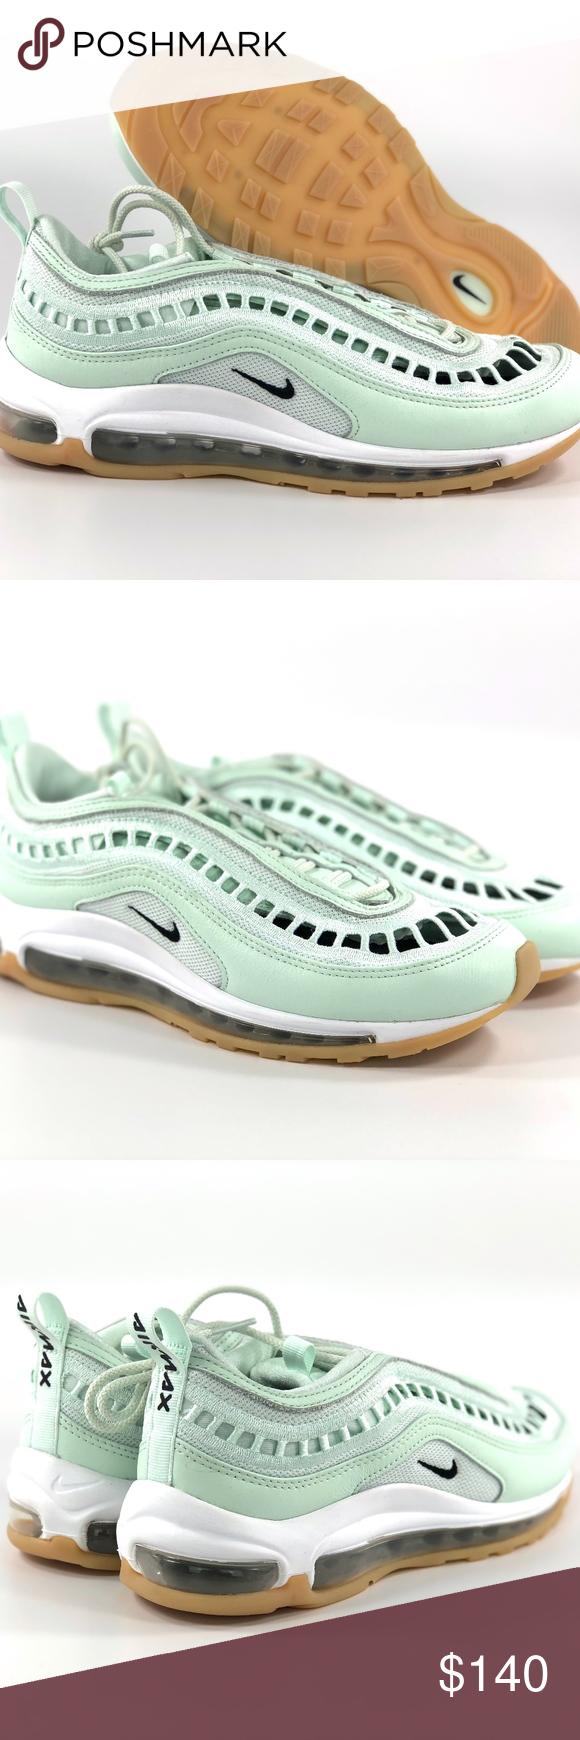 Cheap Nike Air Max 97 Ultra 17 SI Barely Green AO2326 300